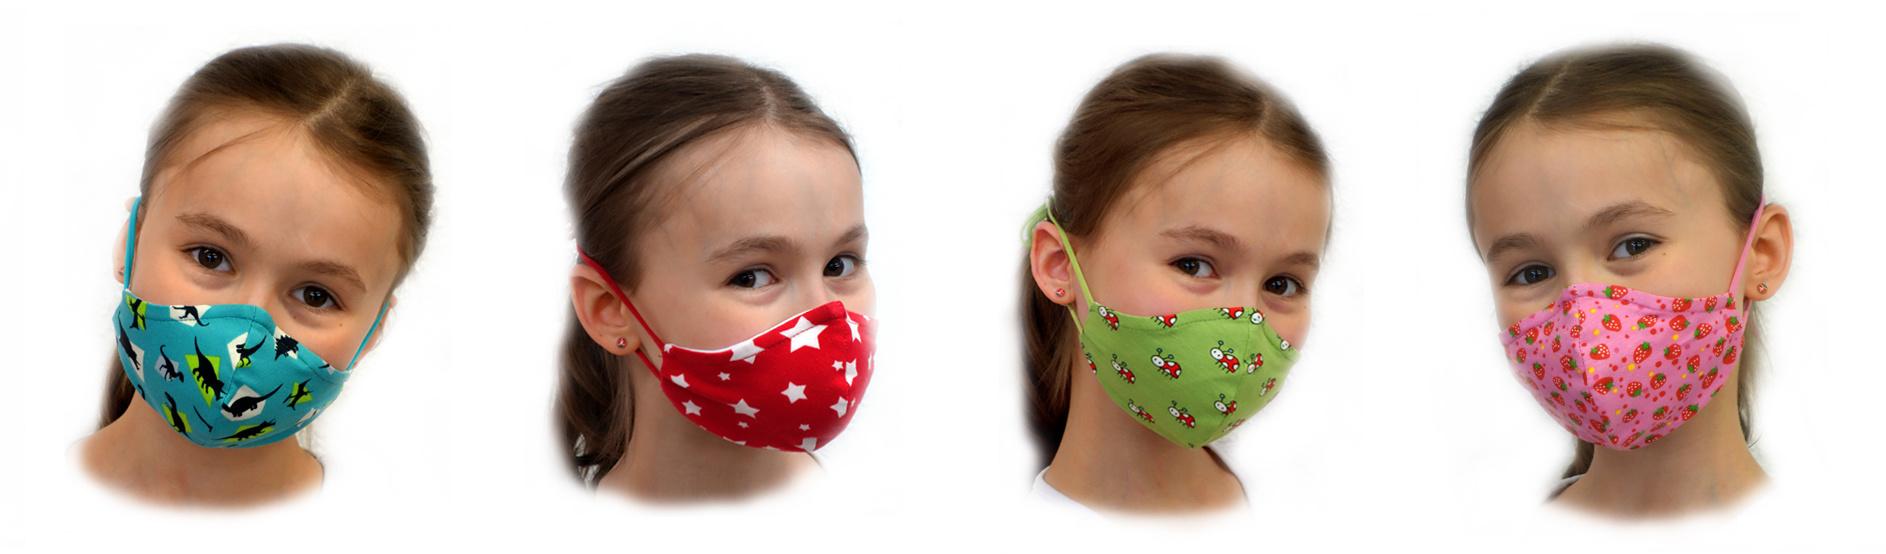 Kindermasken,bunte Masken, bunte Kindermasken,Masken Kinder, Masken Stoff,schöne Stoffmasken,lustige Masken Geschaeft in Wien kaufen online bestellen,Kindermaske